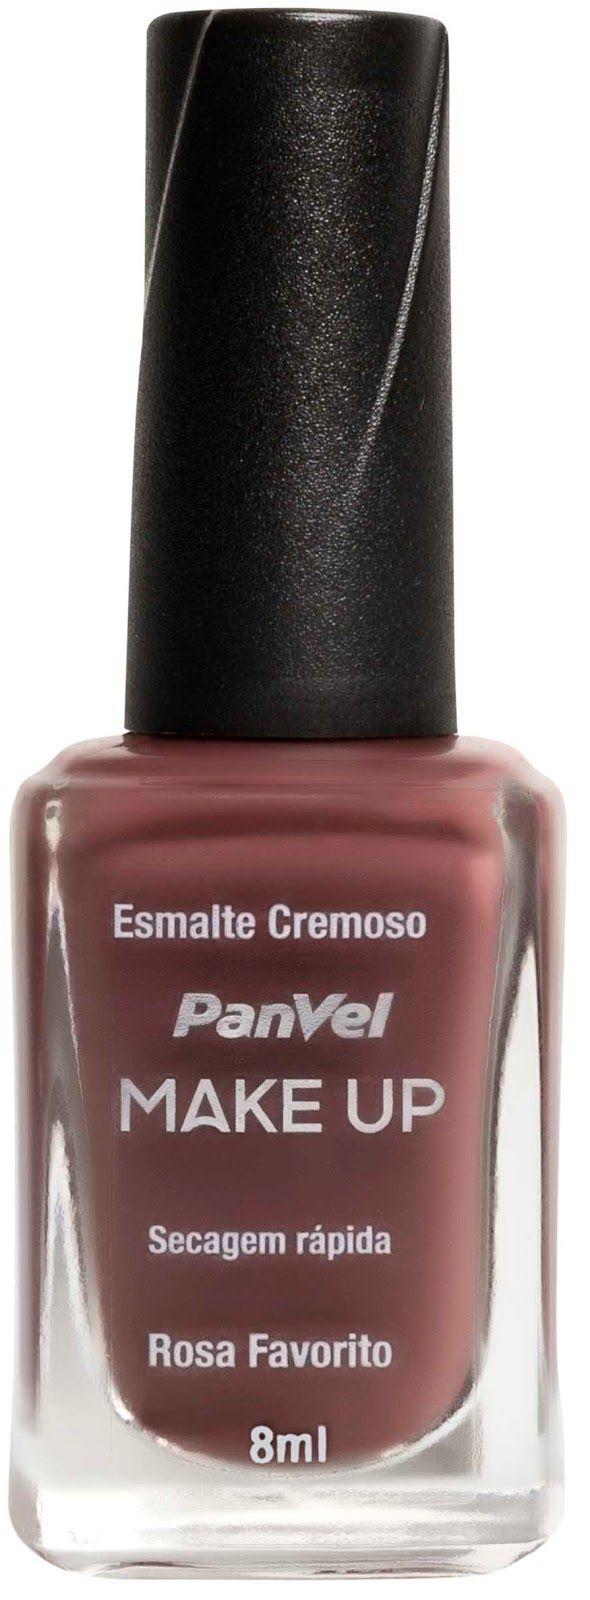 Esmalte Panvel Make Up Rosa Favorito: R$ 4,35